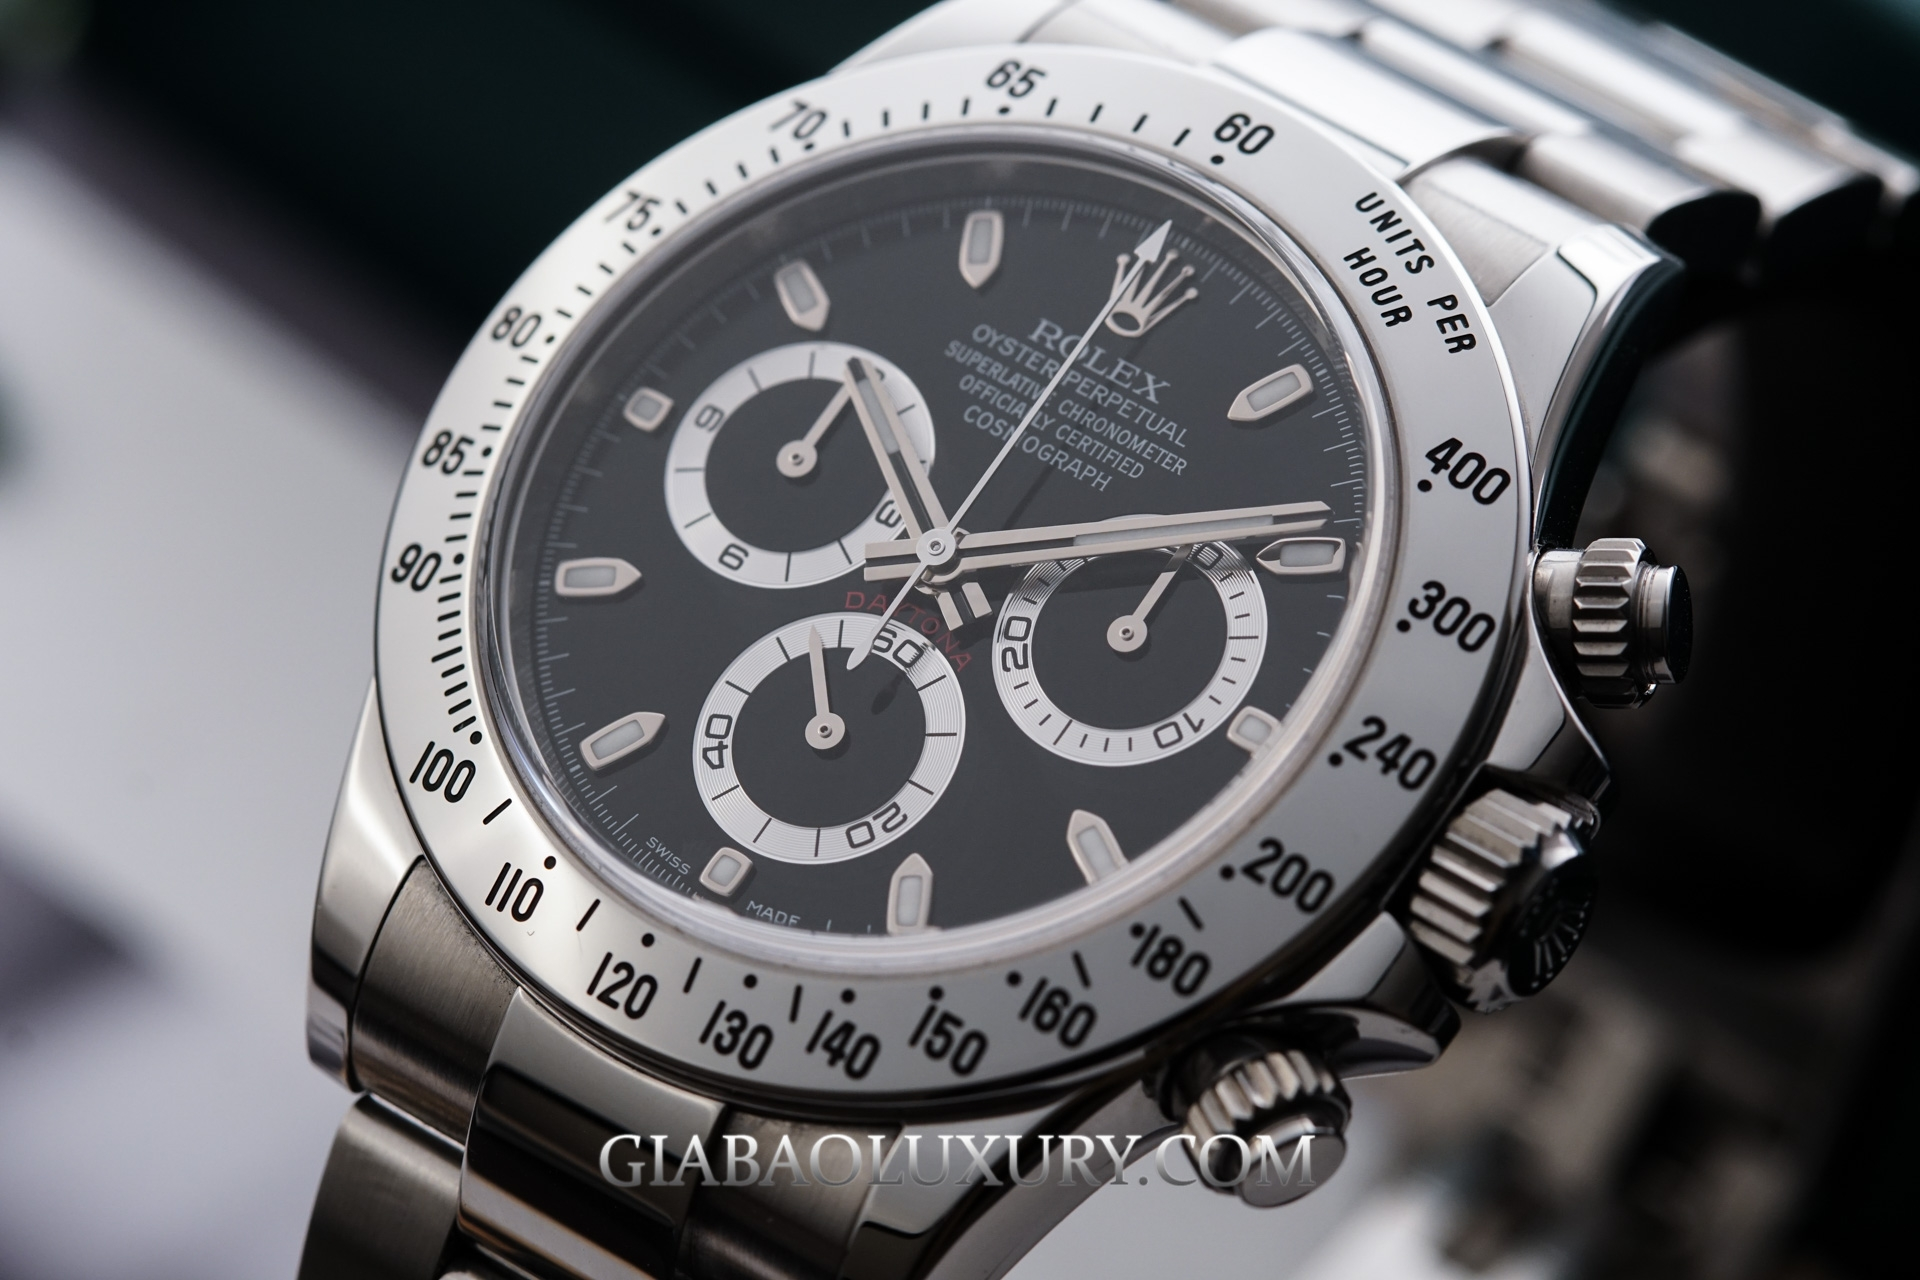 Đồng Hồ Rolex Cosmograph Daytona 116520